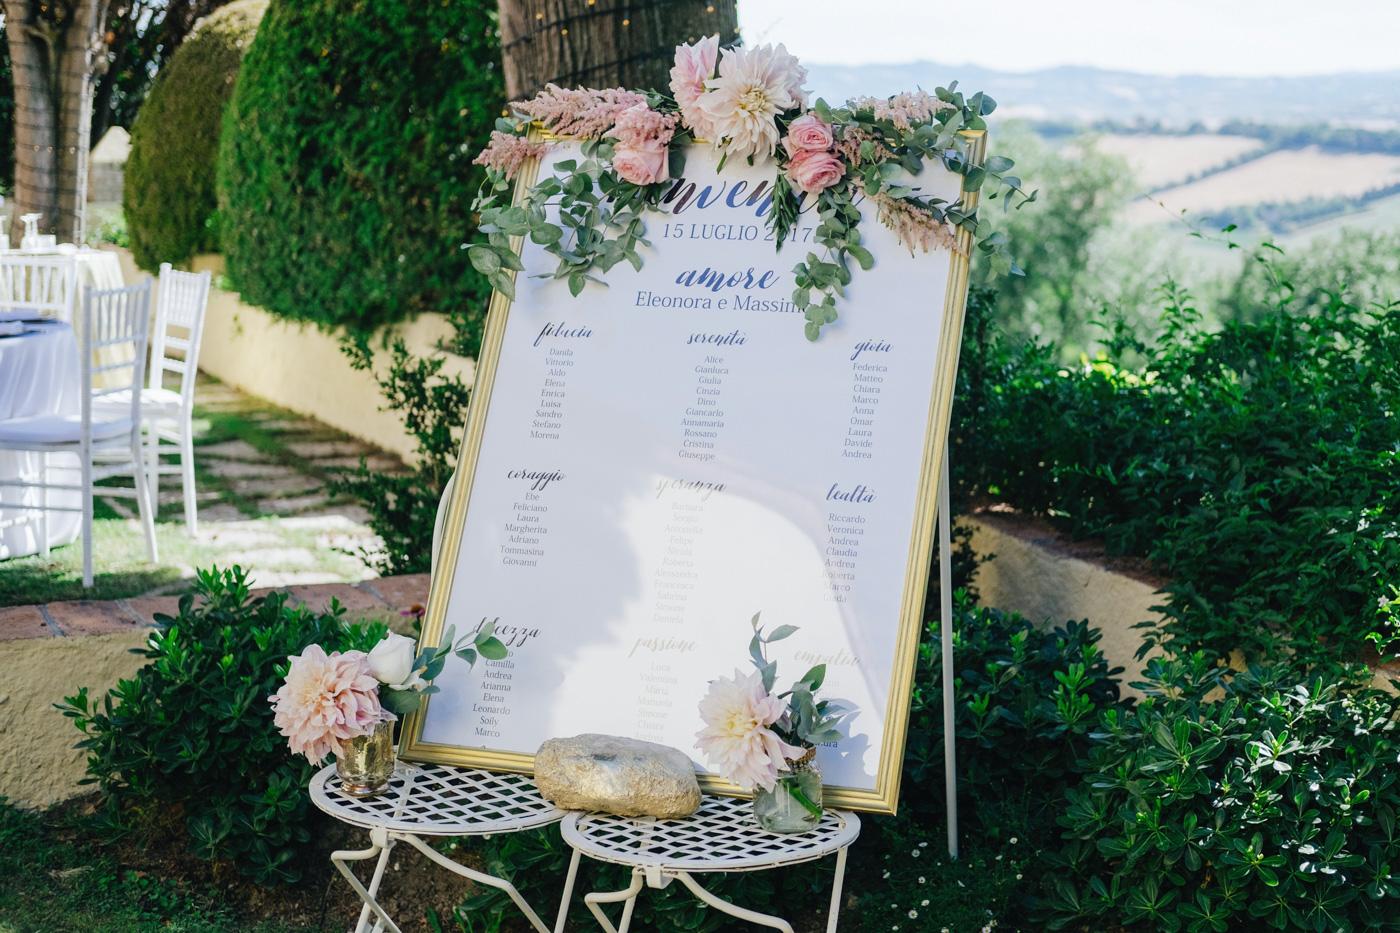 Matrimoni all'italiana wedding photographer italy-29.jpg